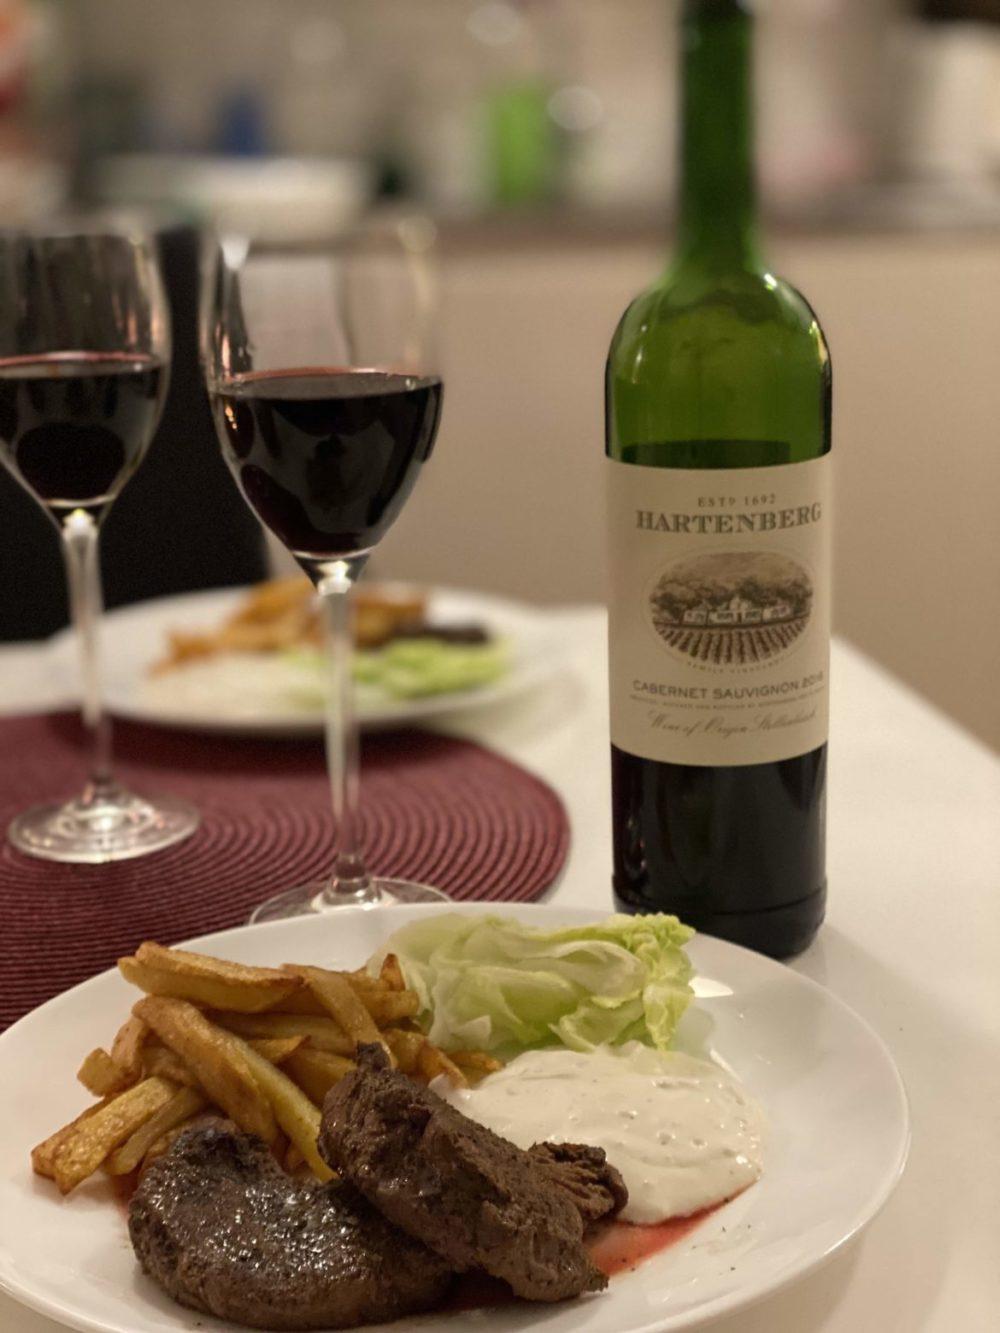 hartenberg cabernet sauvignon 2016 rödvin